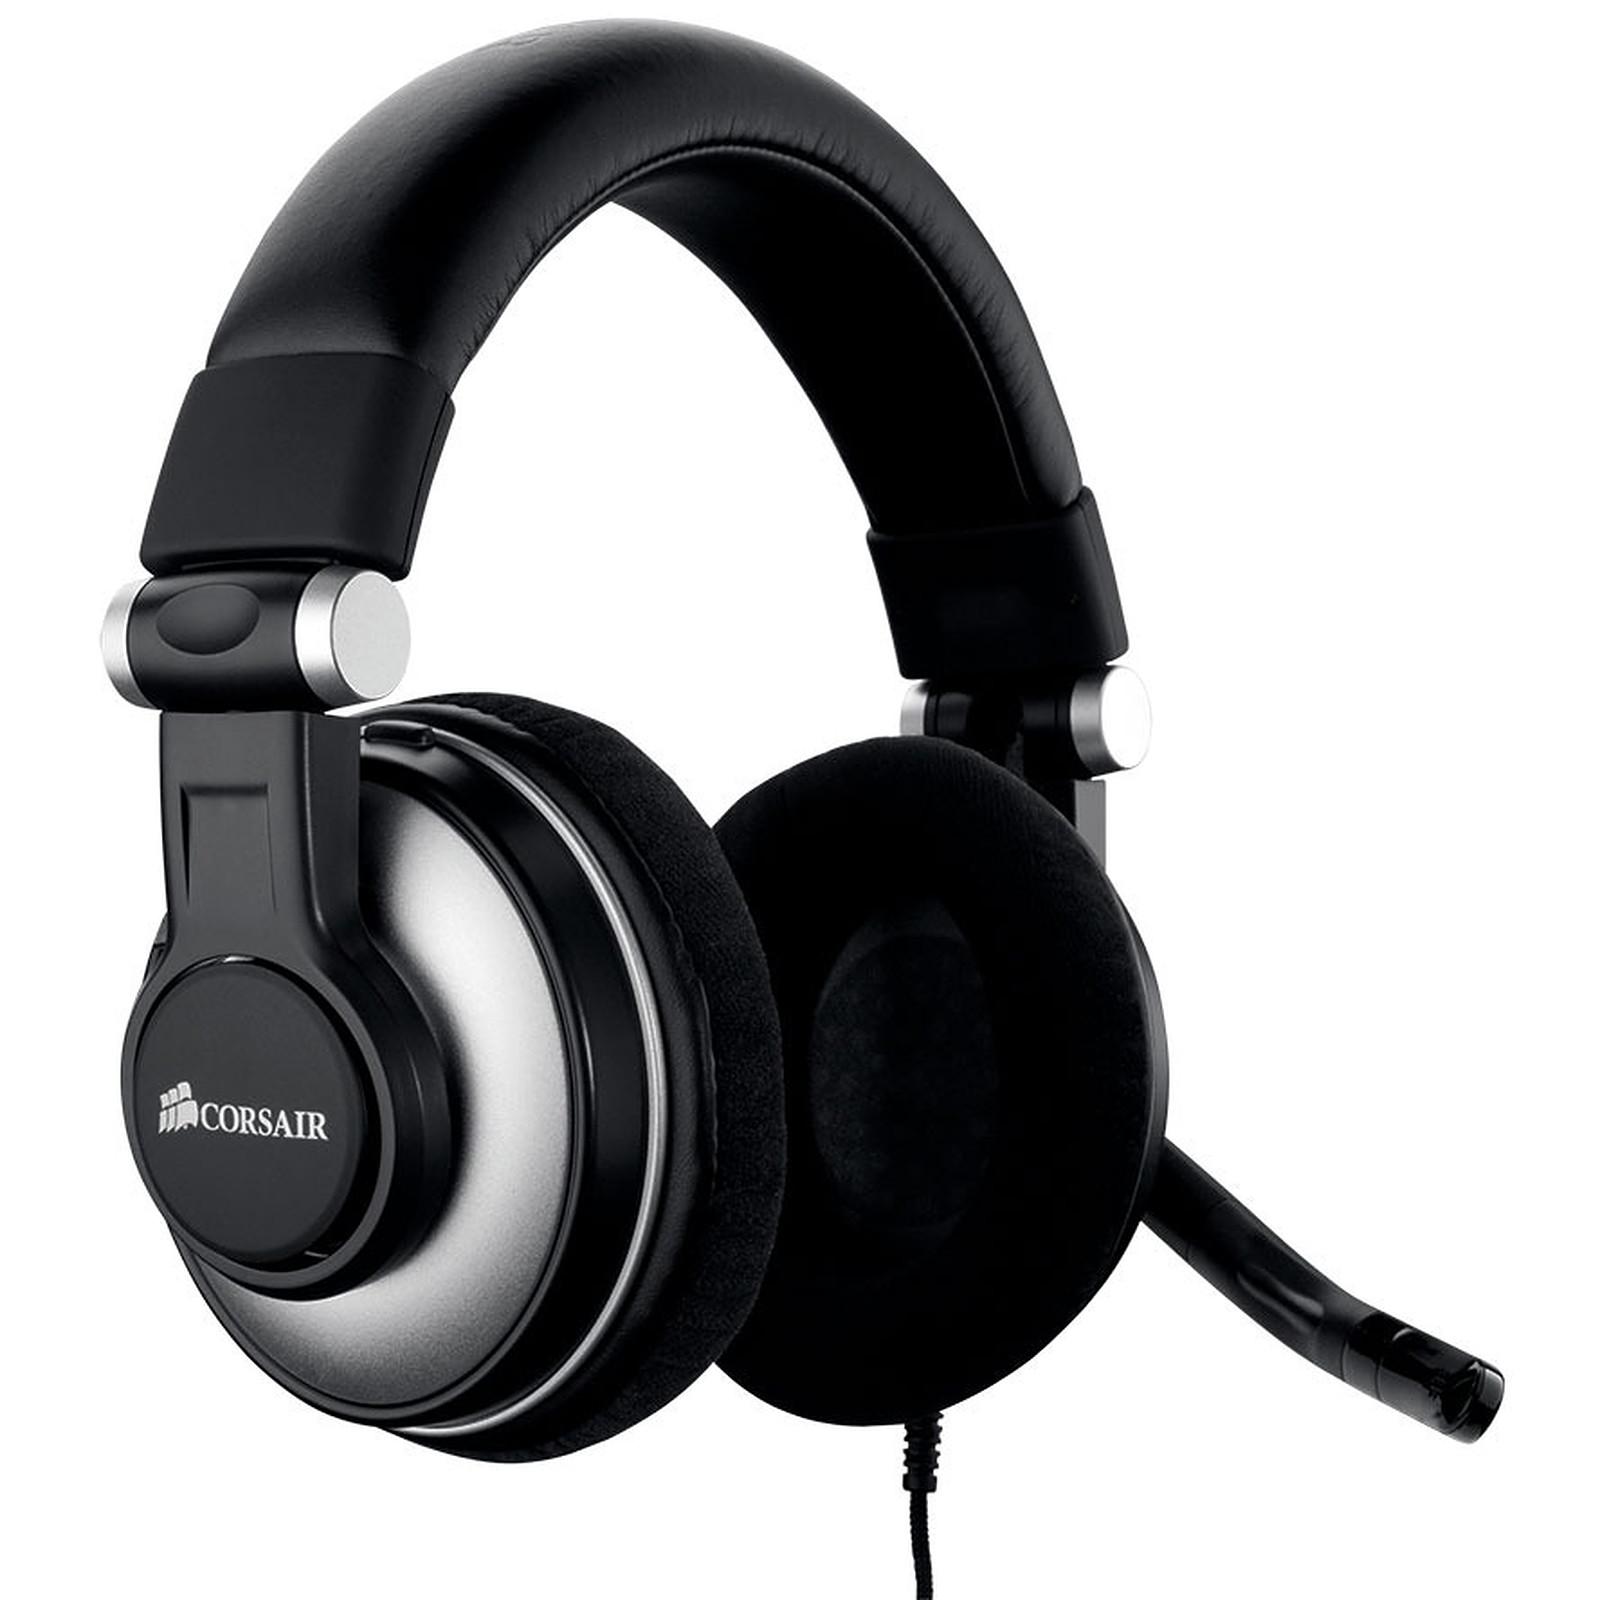 Corsair HS1 USB Gaming Headset